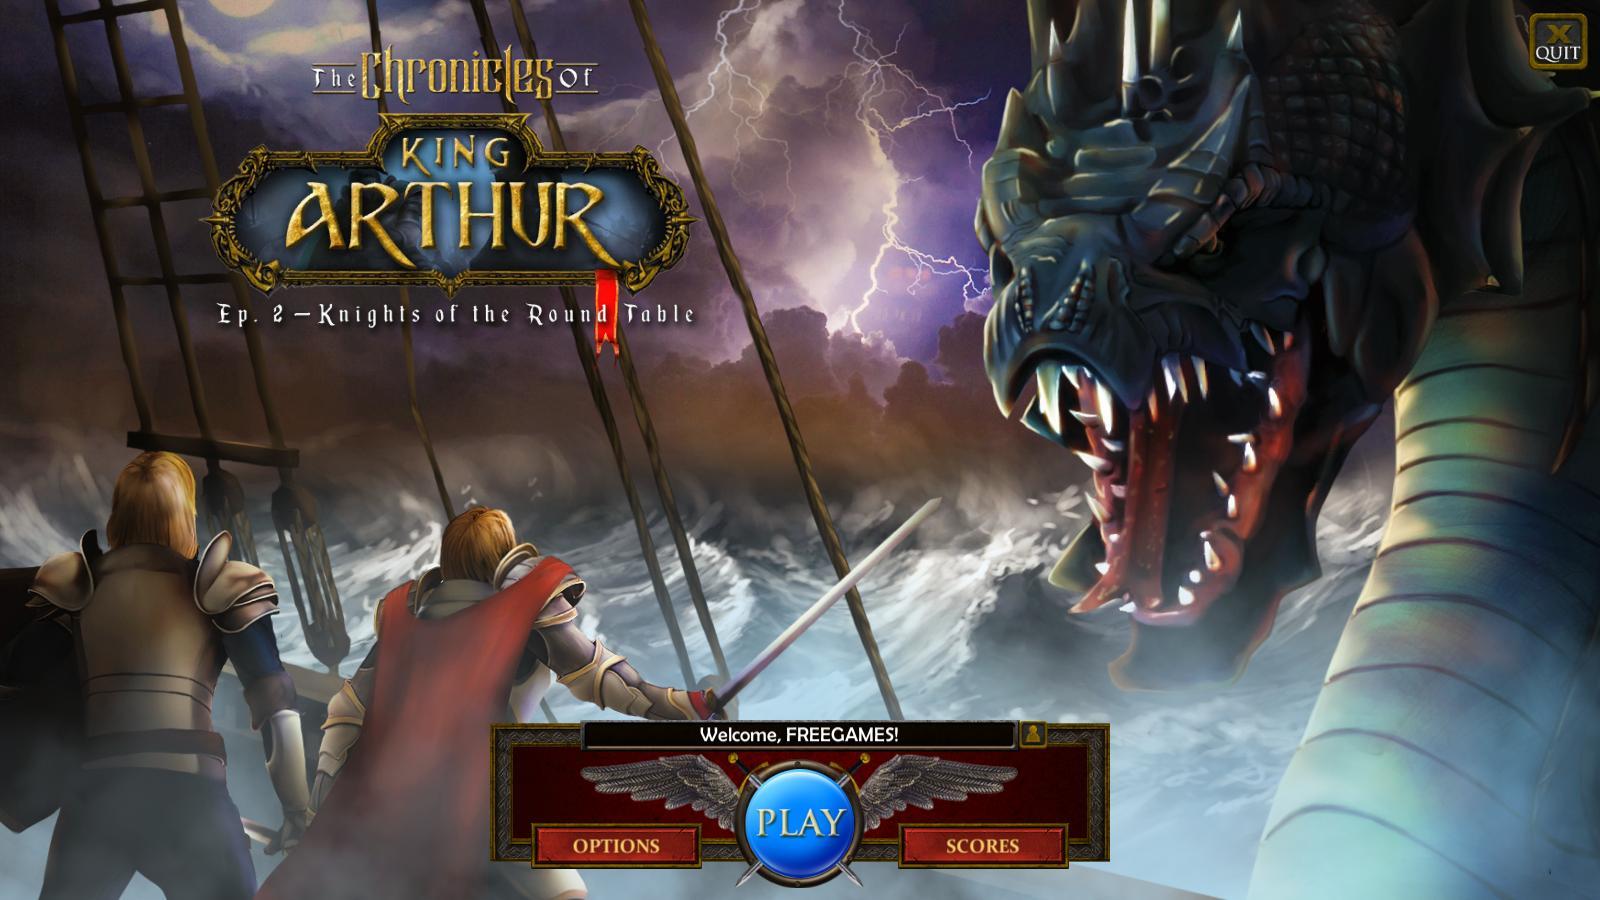 Хроники Короля Артура: Эпизод 2: Рыцари Круглого Стола | The Chronicles of King Arthur. Episode 2: Knights of the Round Table (En)